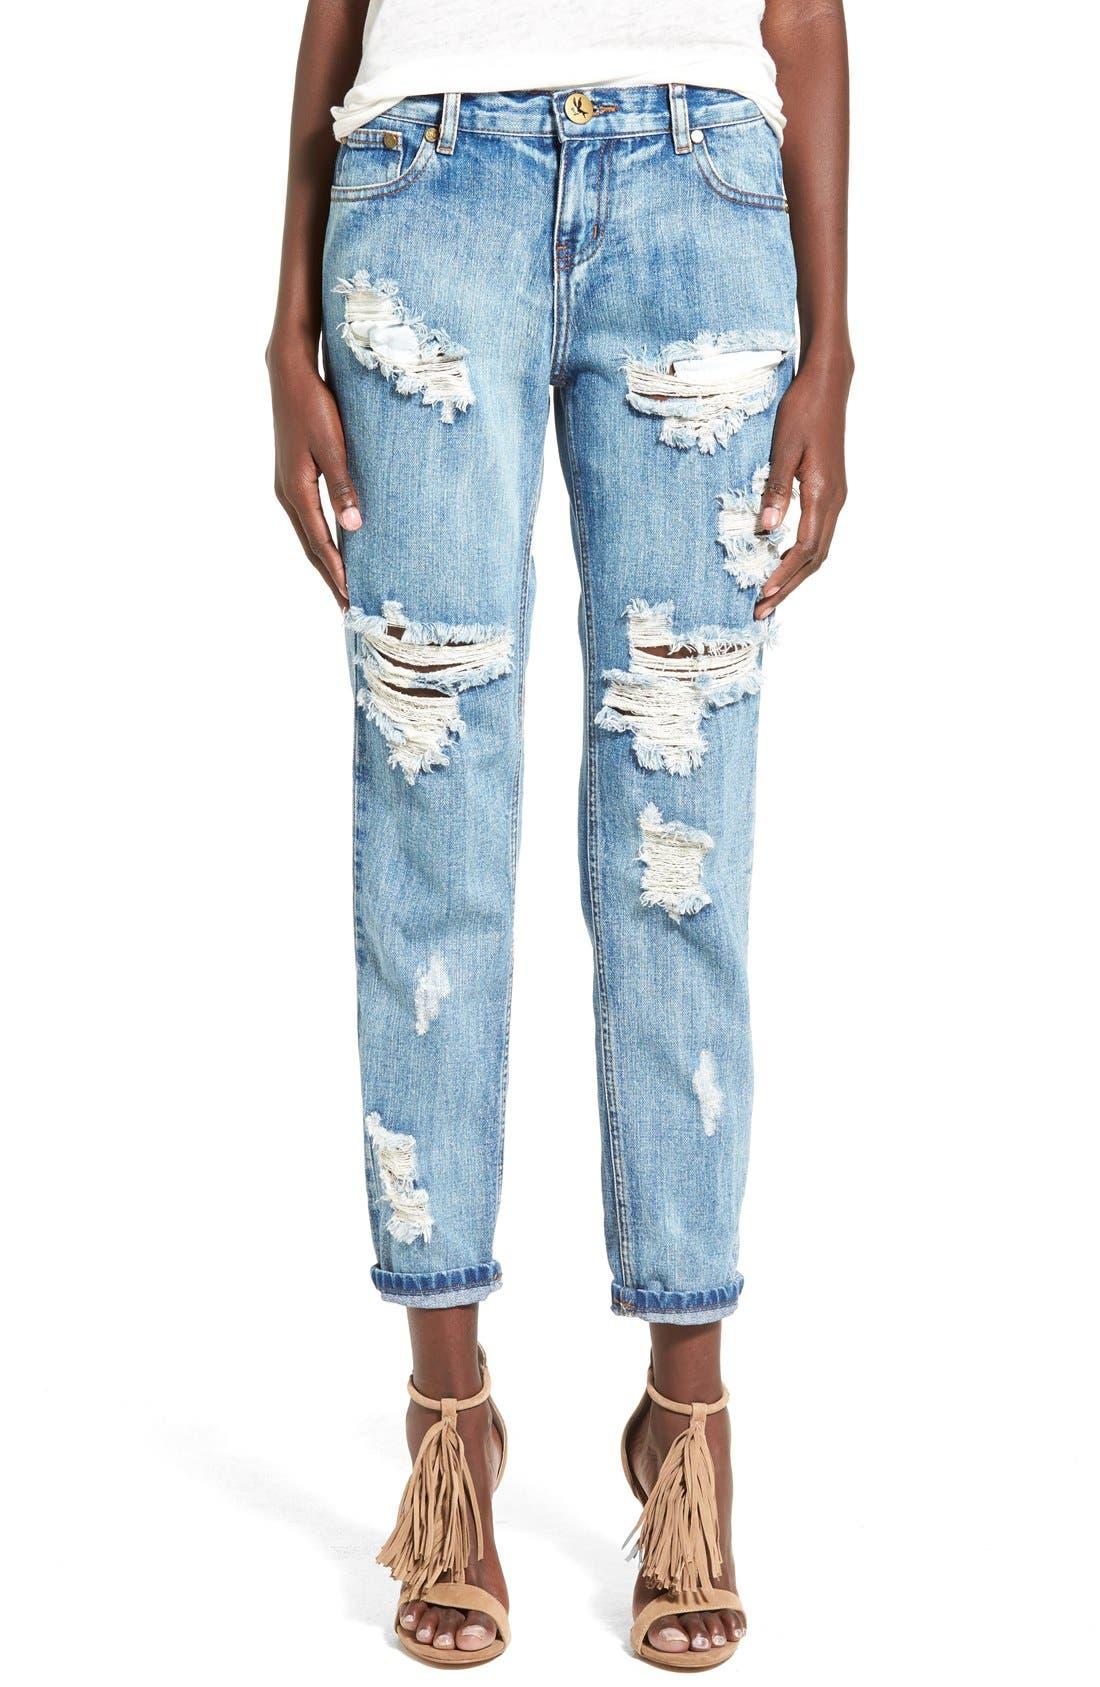 Main Image - One Teaspoon 'Awesome Baggies' CropBoyfriend Jeans